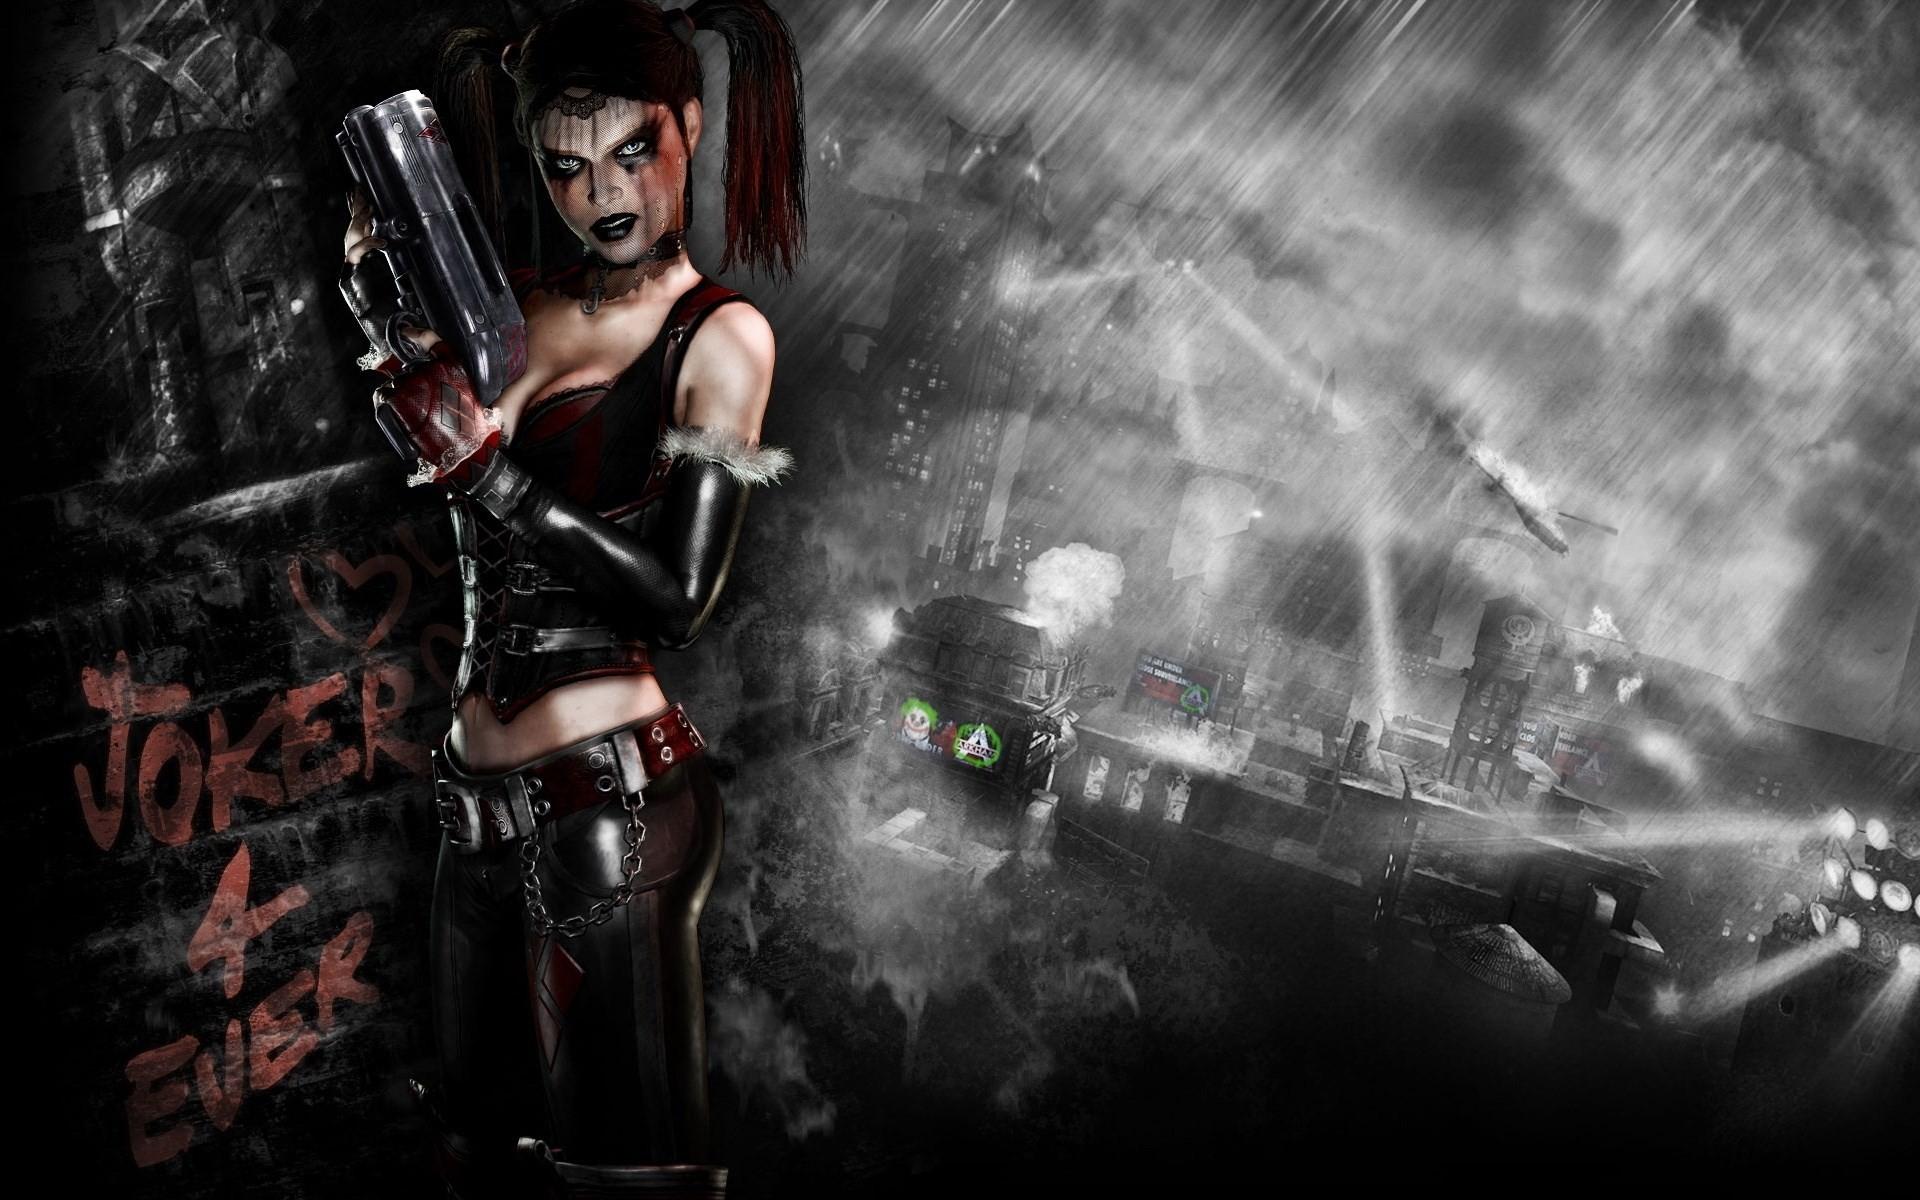 Harley Quinn Wallpaper HD 1080p (78+ Images